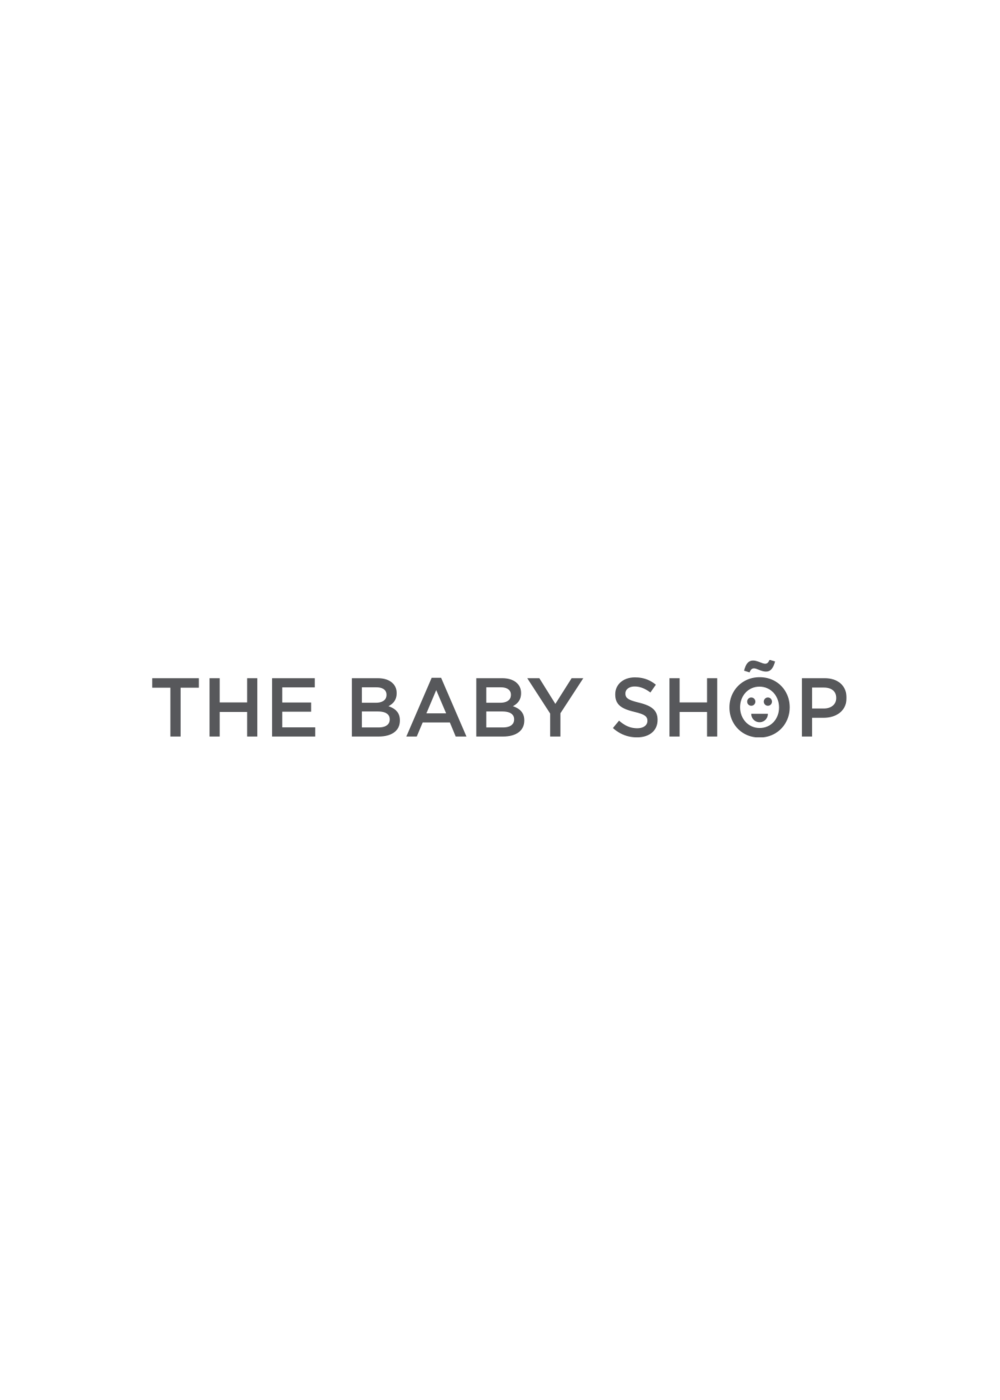 logo_babyshop.png